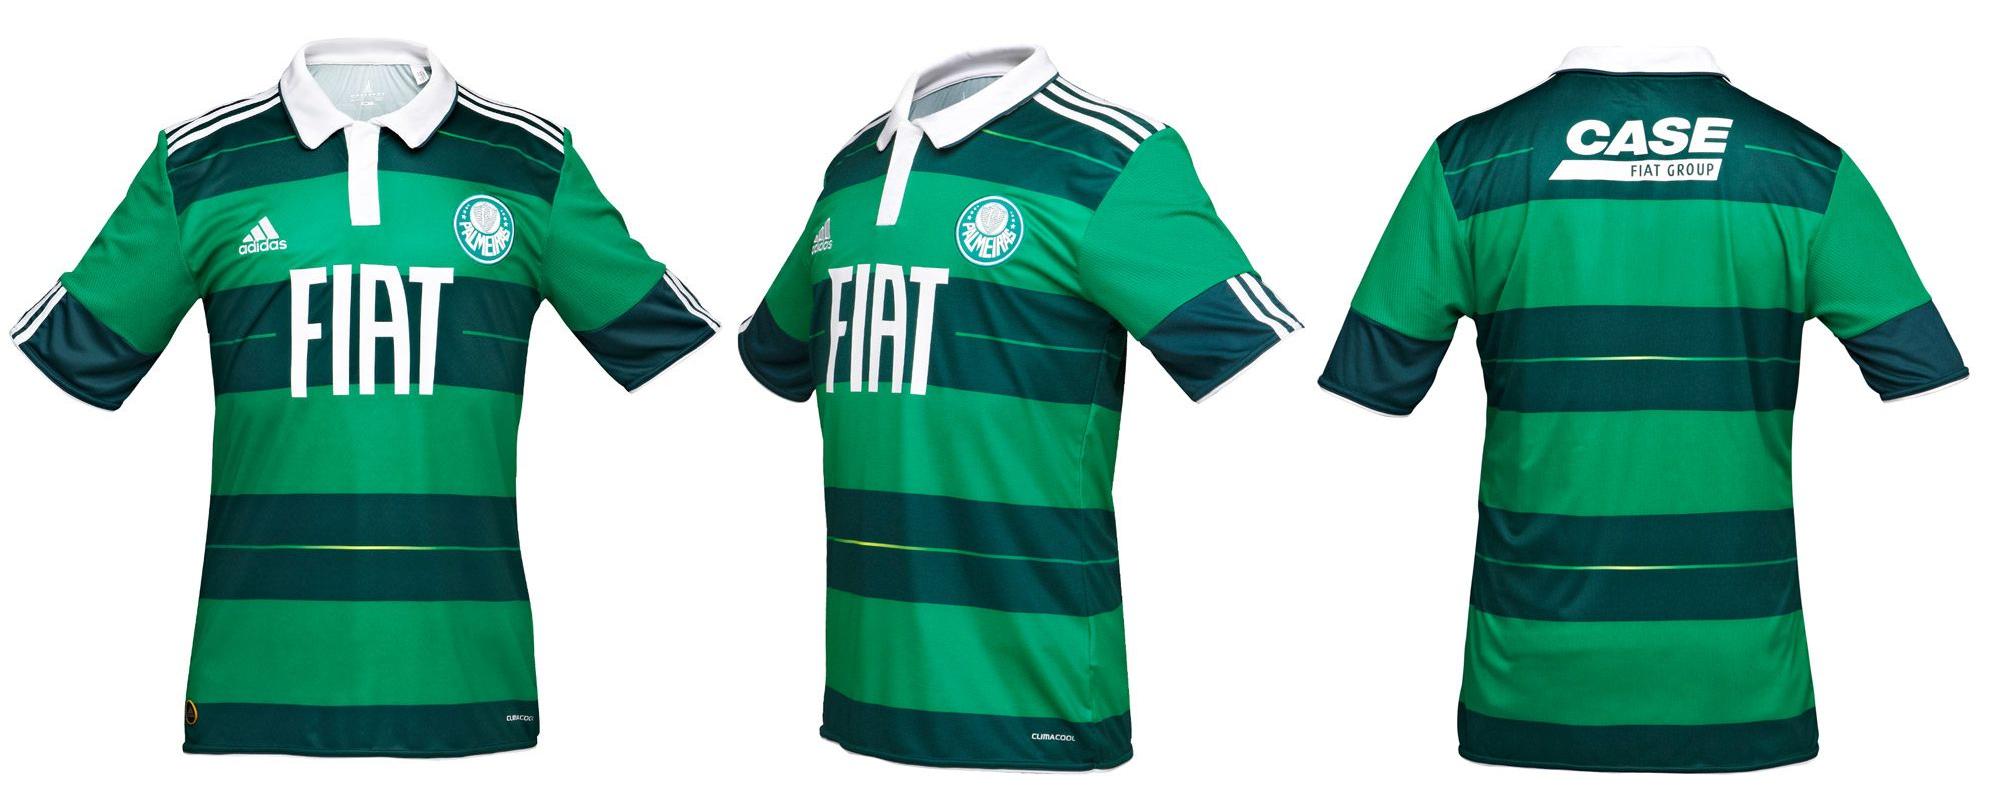 4e8c9febef3d7 Adidas and Palmeiras present third jersey for the 2010 2011 season ...